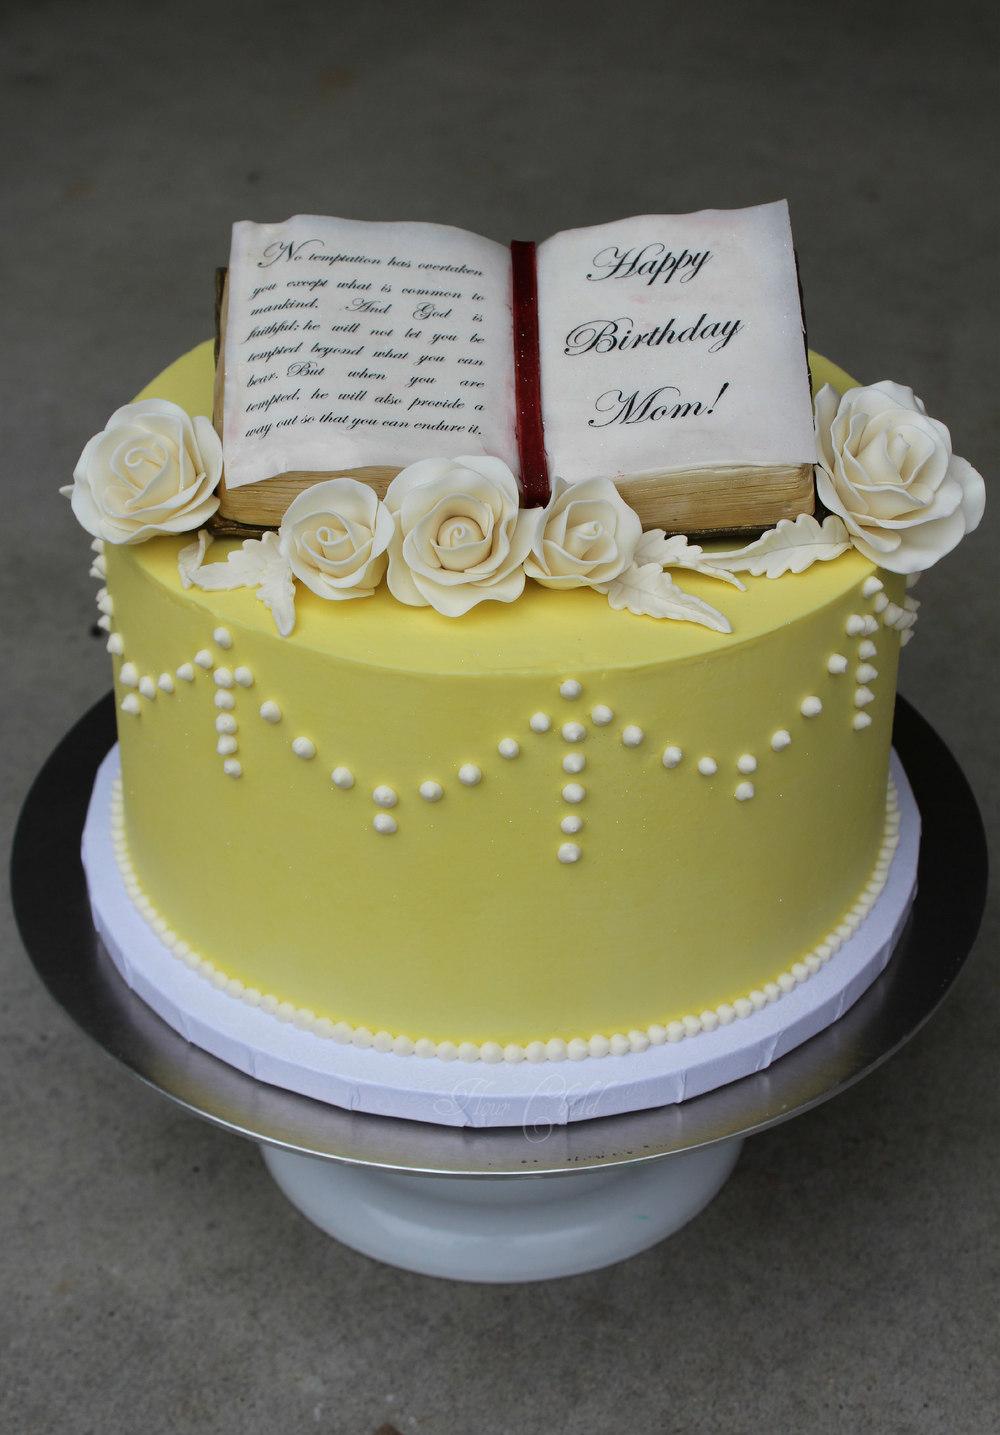 Rams Birthday Cake   www.topsimages.com